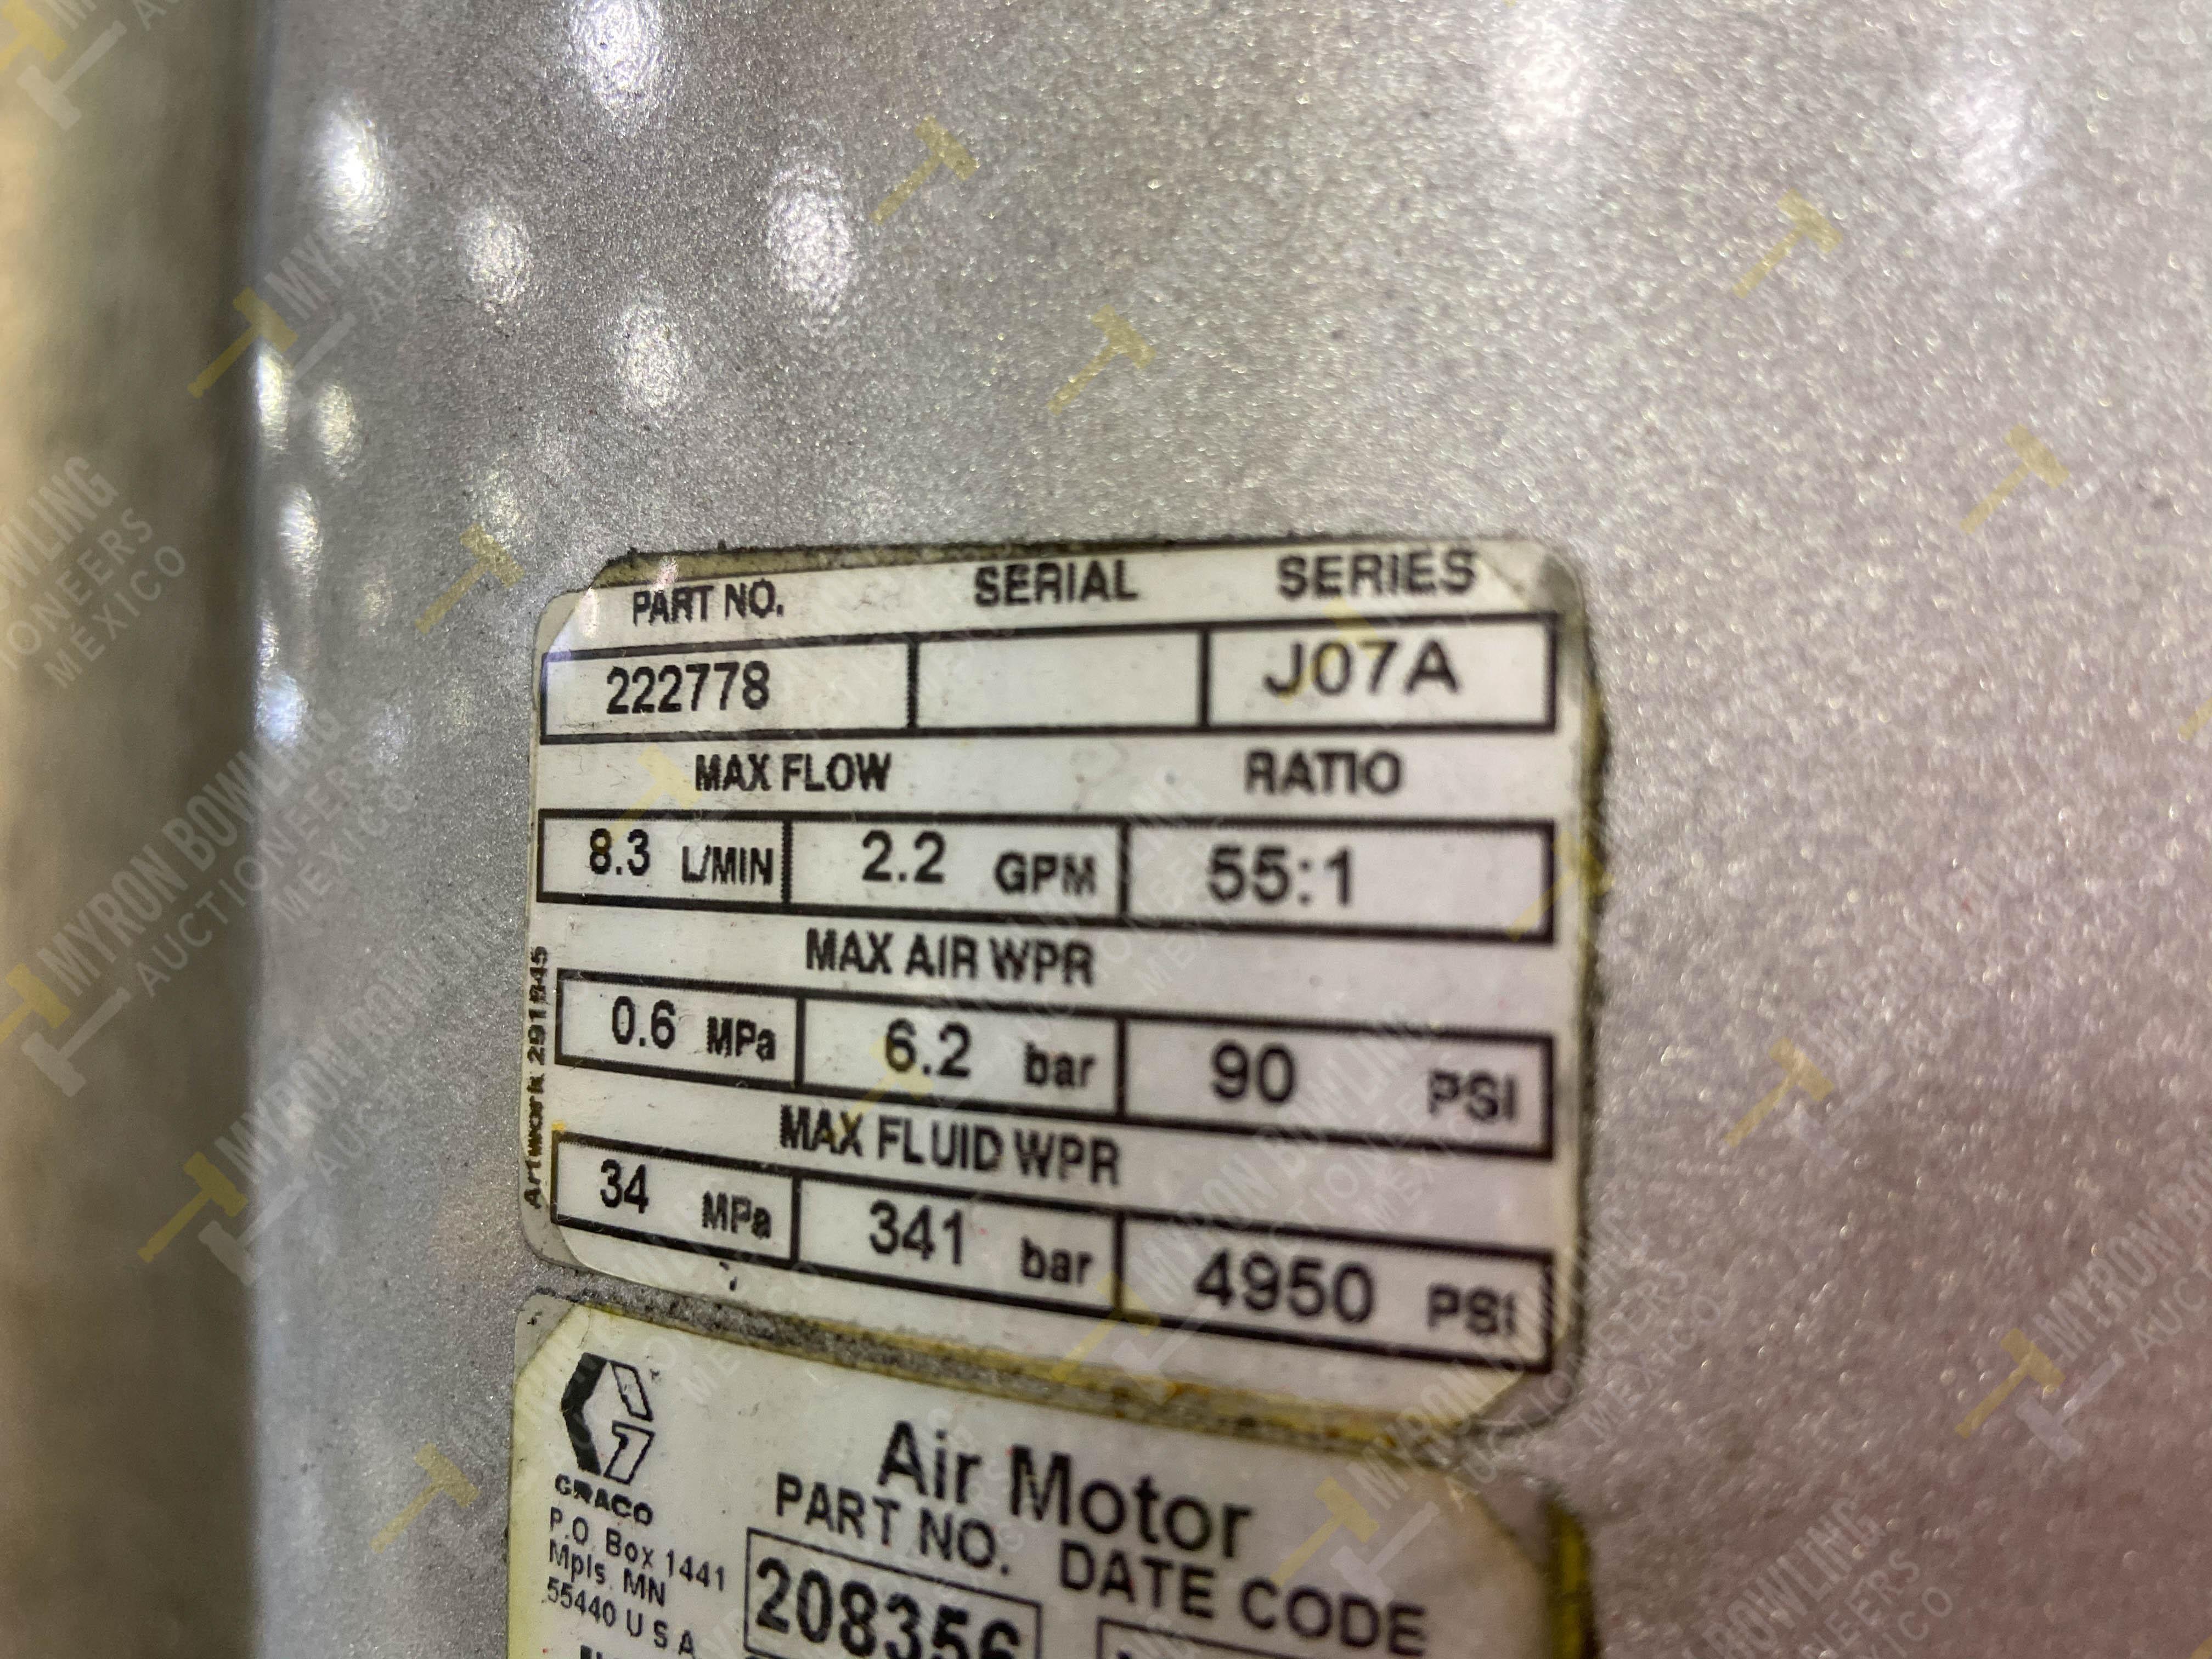 Dos sistemas de dispensador de sellador RTV (bombas) marca Graco Bulldog, 8.3 L/min max - Image 10 of 12